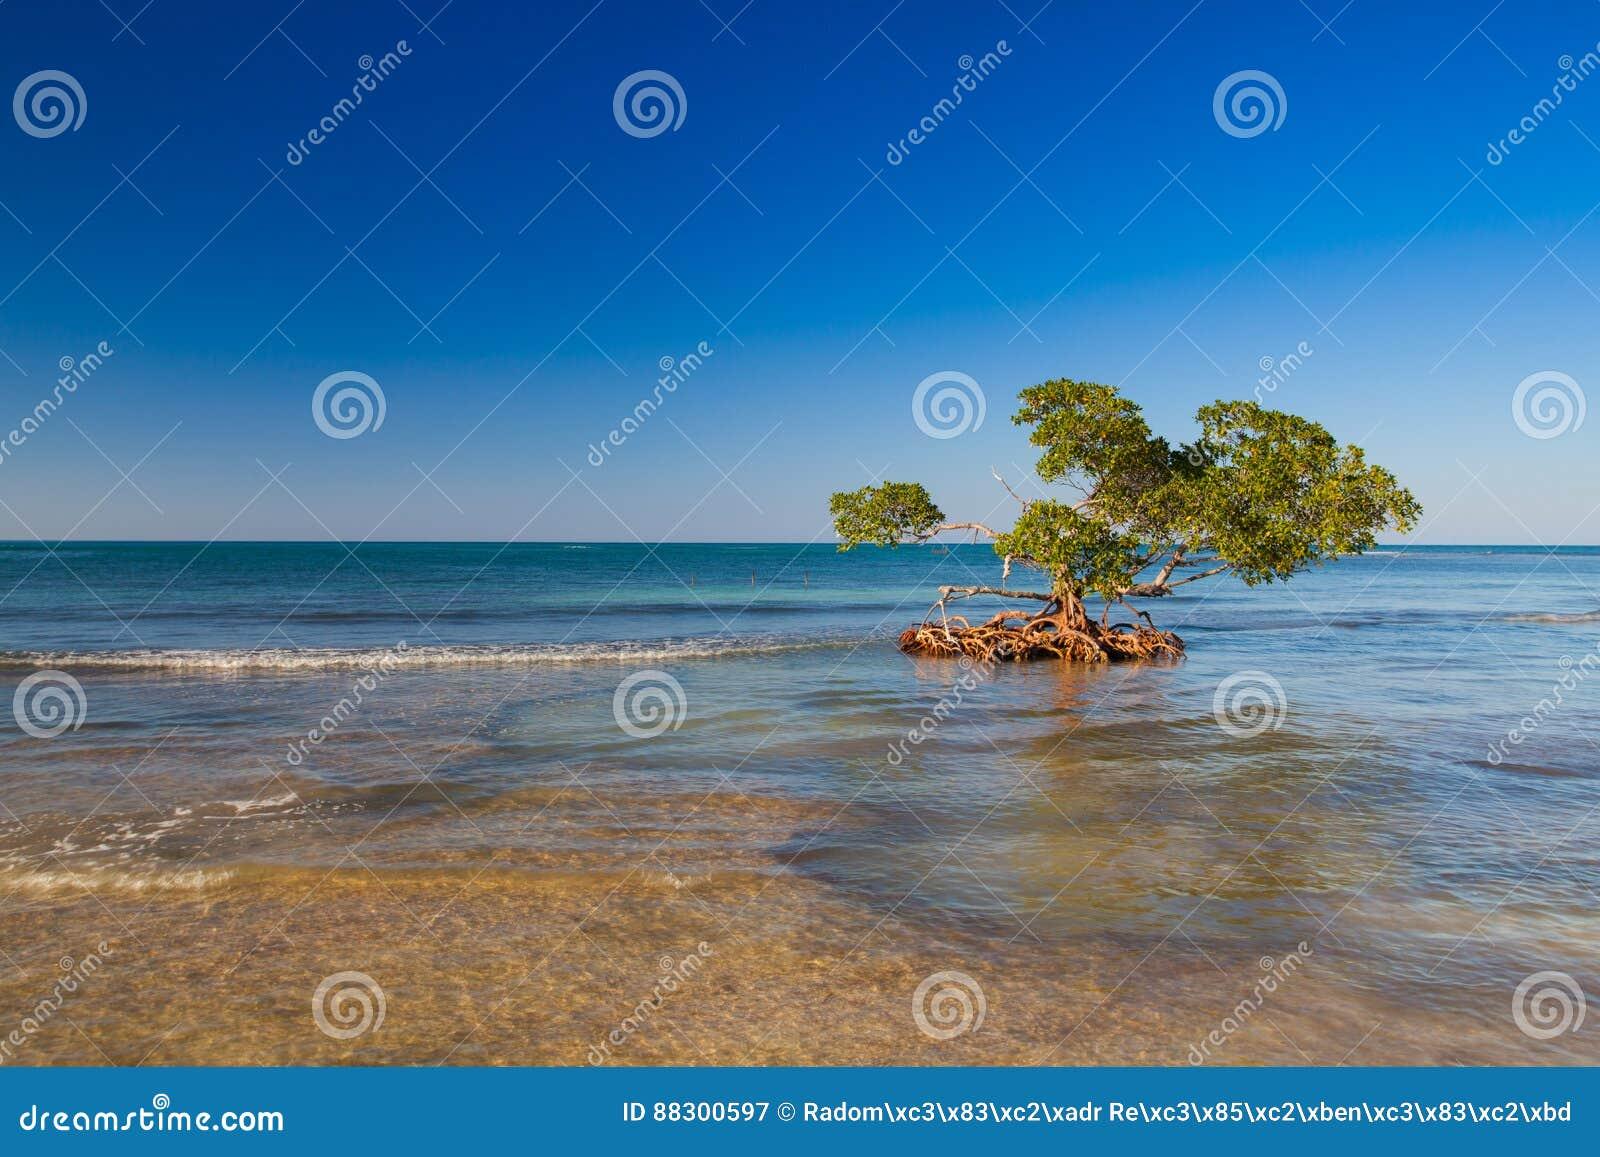 pal tuviers au bord de la mer des cara bes plage de cayo jutias cuba image stock image 88300597. Black Bedroom Furniture Sets. Home Design Ideas